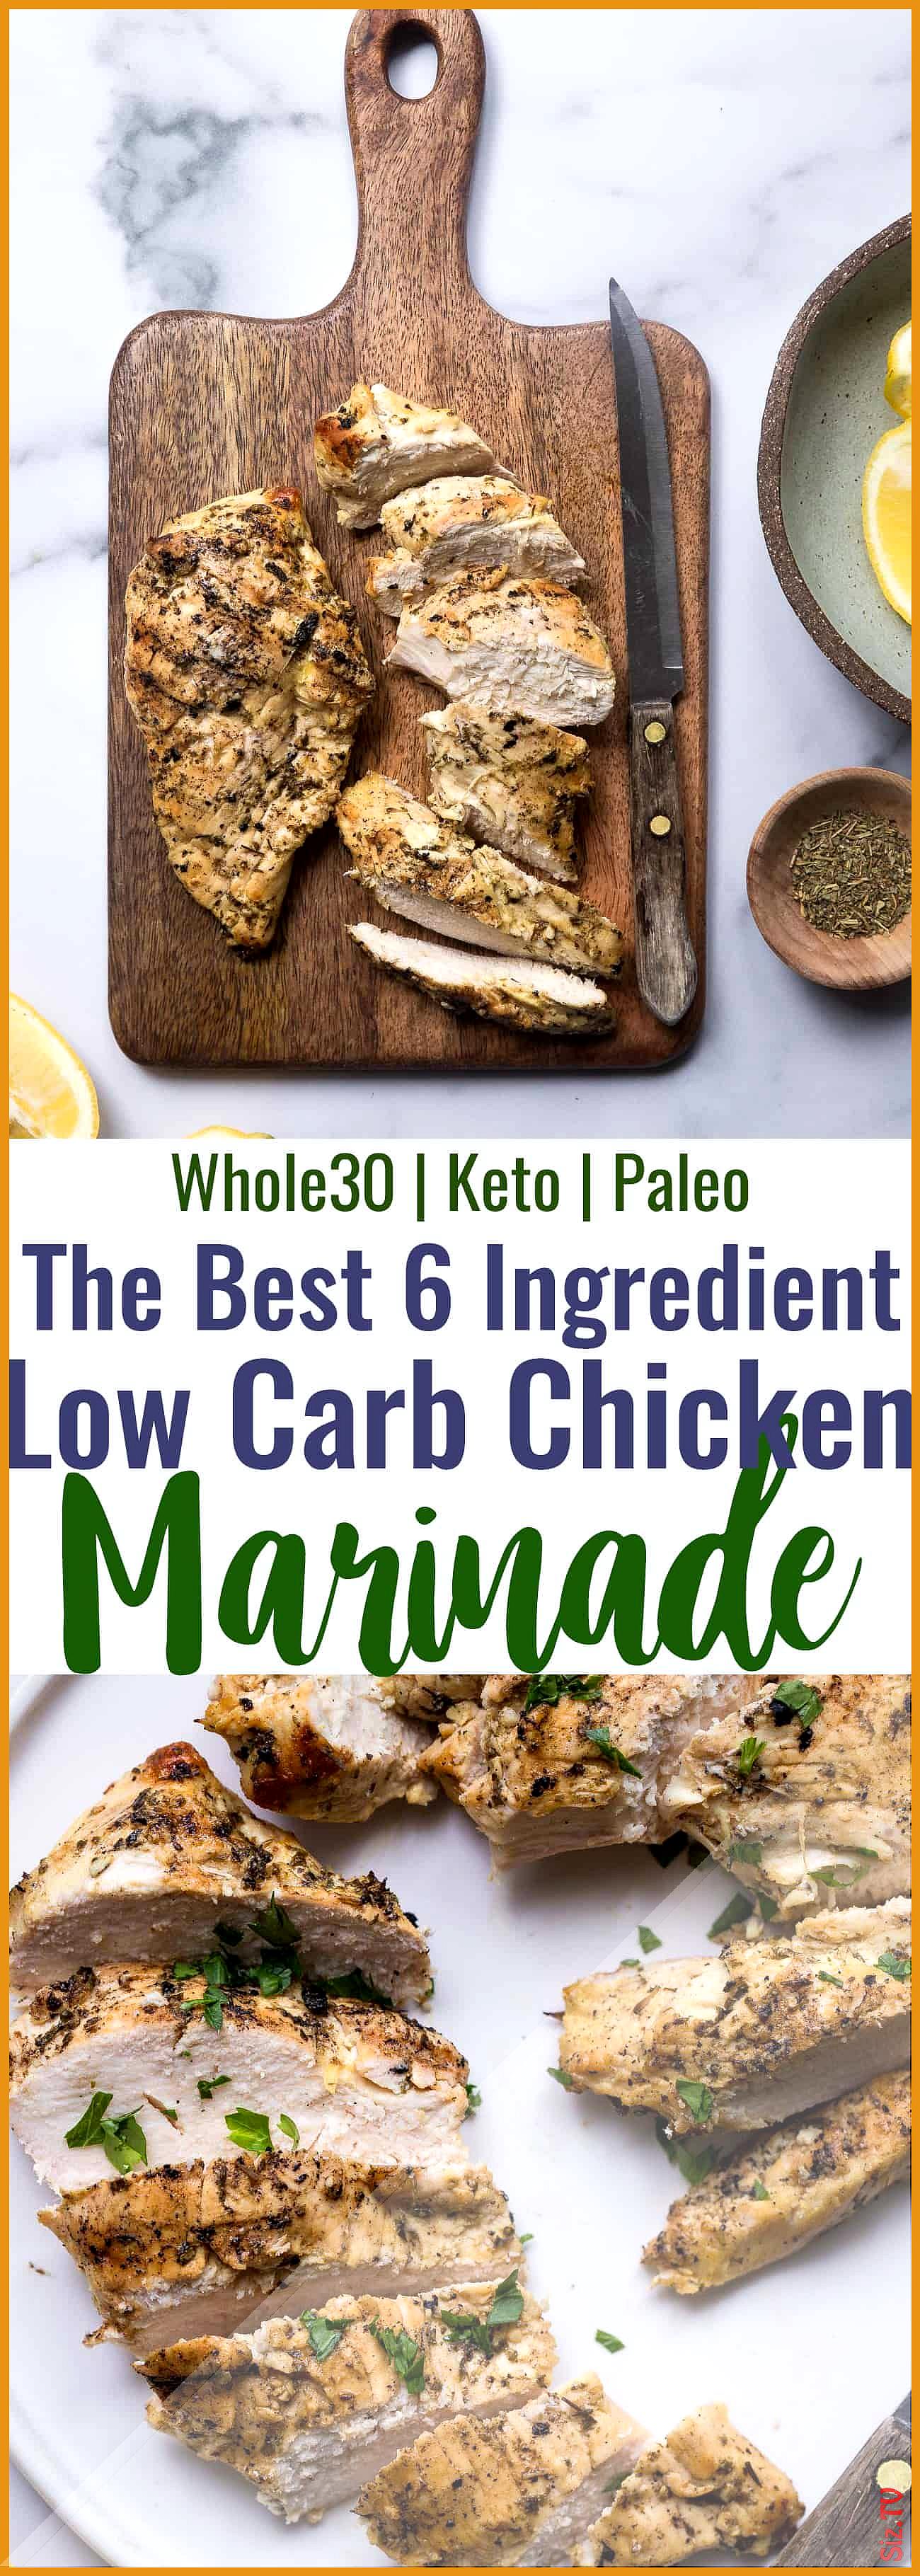 Keto Chicken Marinade for Grilled Chicken  Food Faith Fitness Keto Chicken Marinade for Grilled Chic...